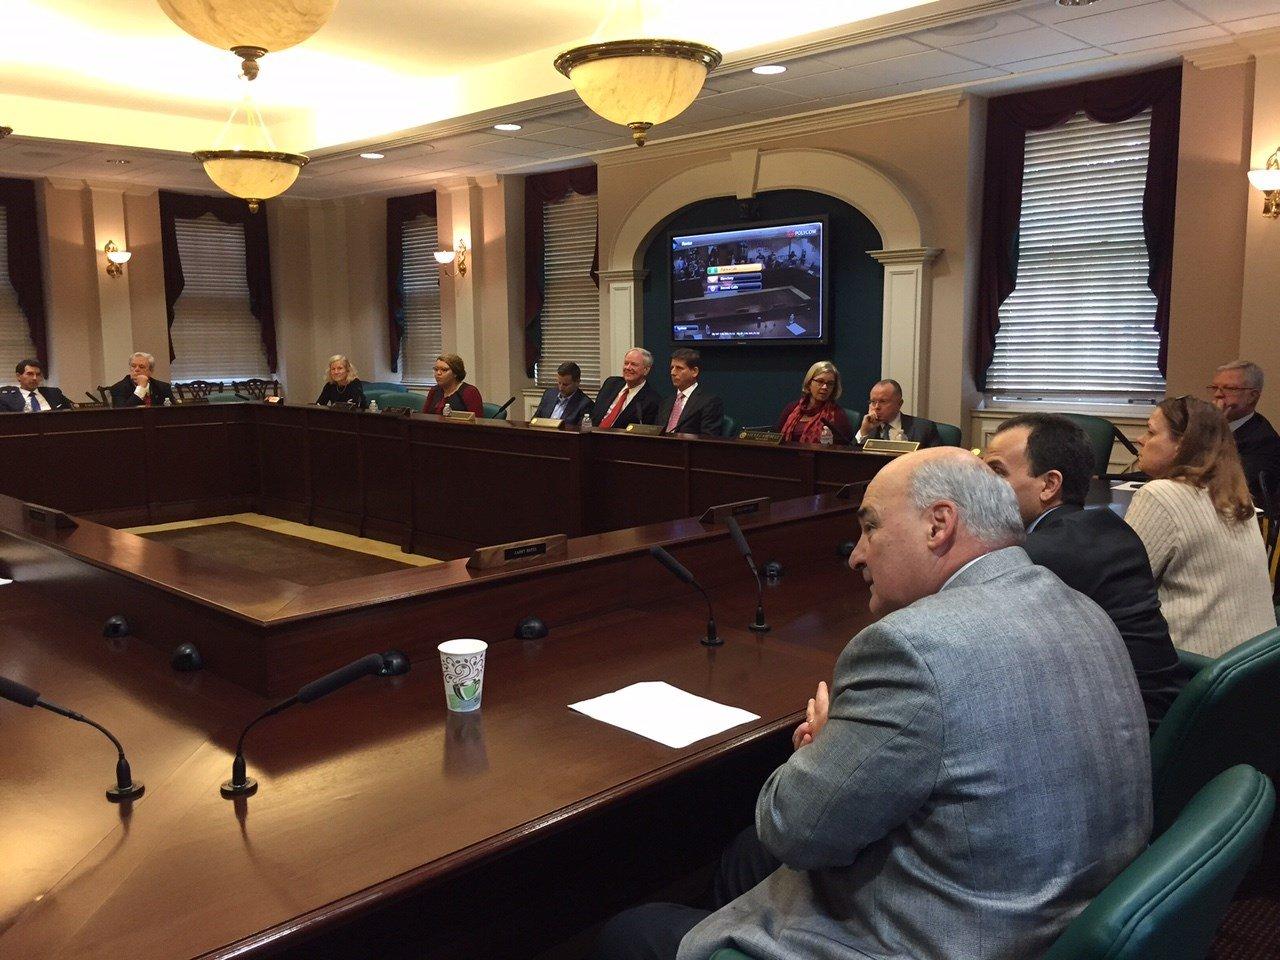 University of Louisville Board of Trustees, Nov. 5, 2015